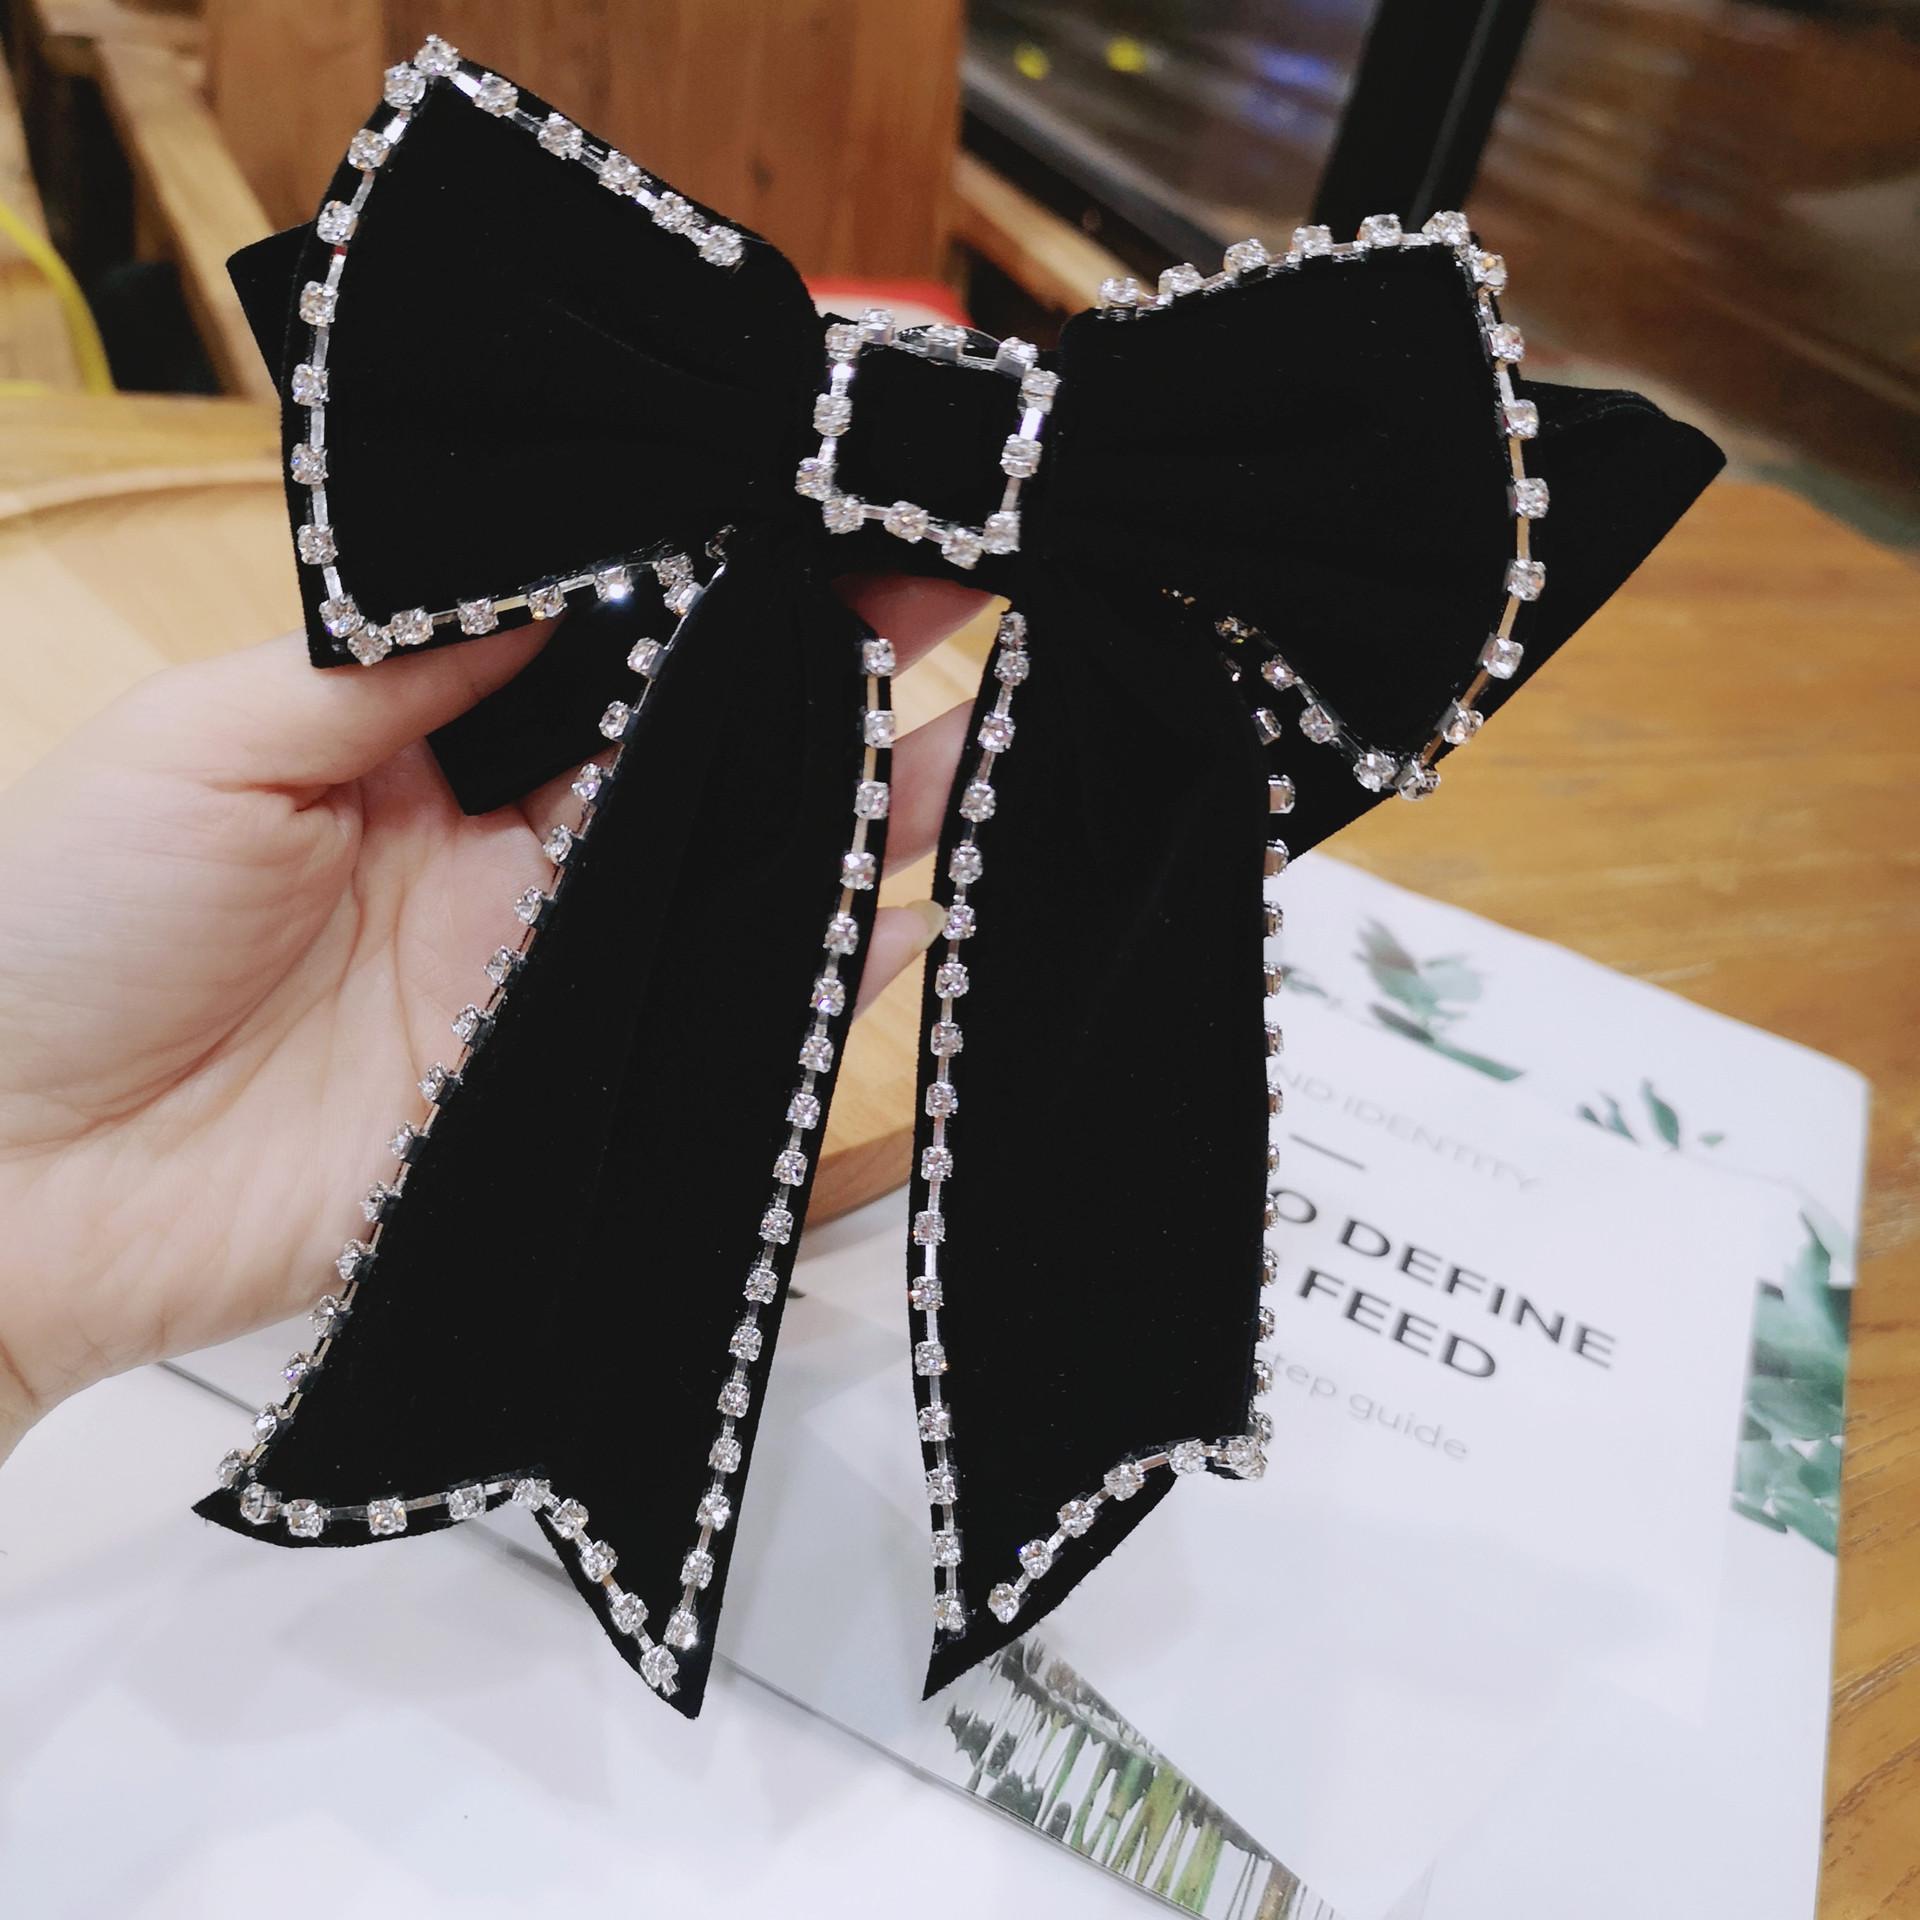 Sleek Rhinestone-Studded Black Ribbon Brooch for Pairing with Dress Shirts